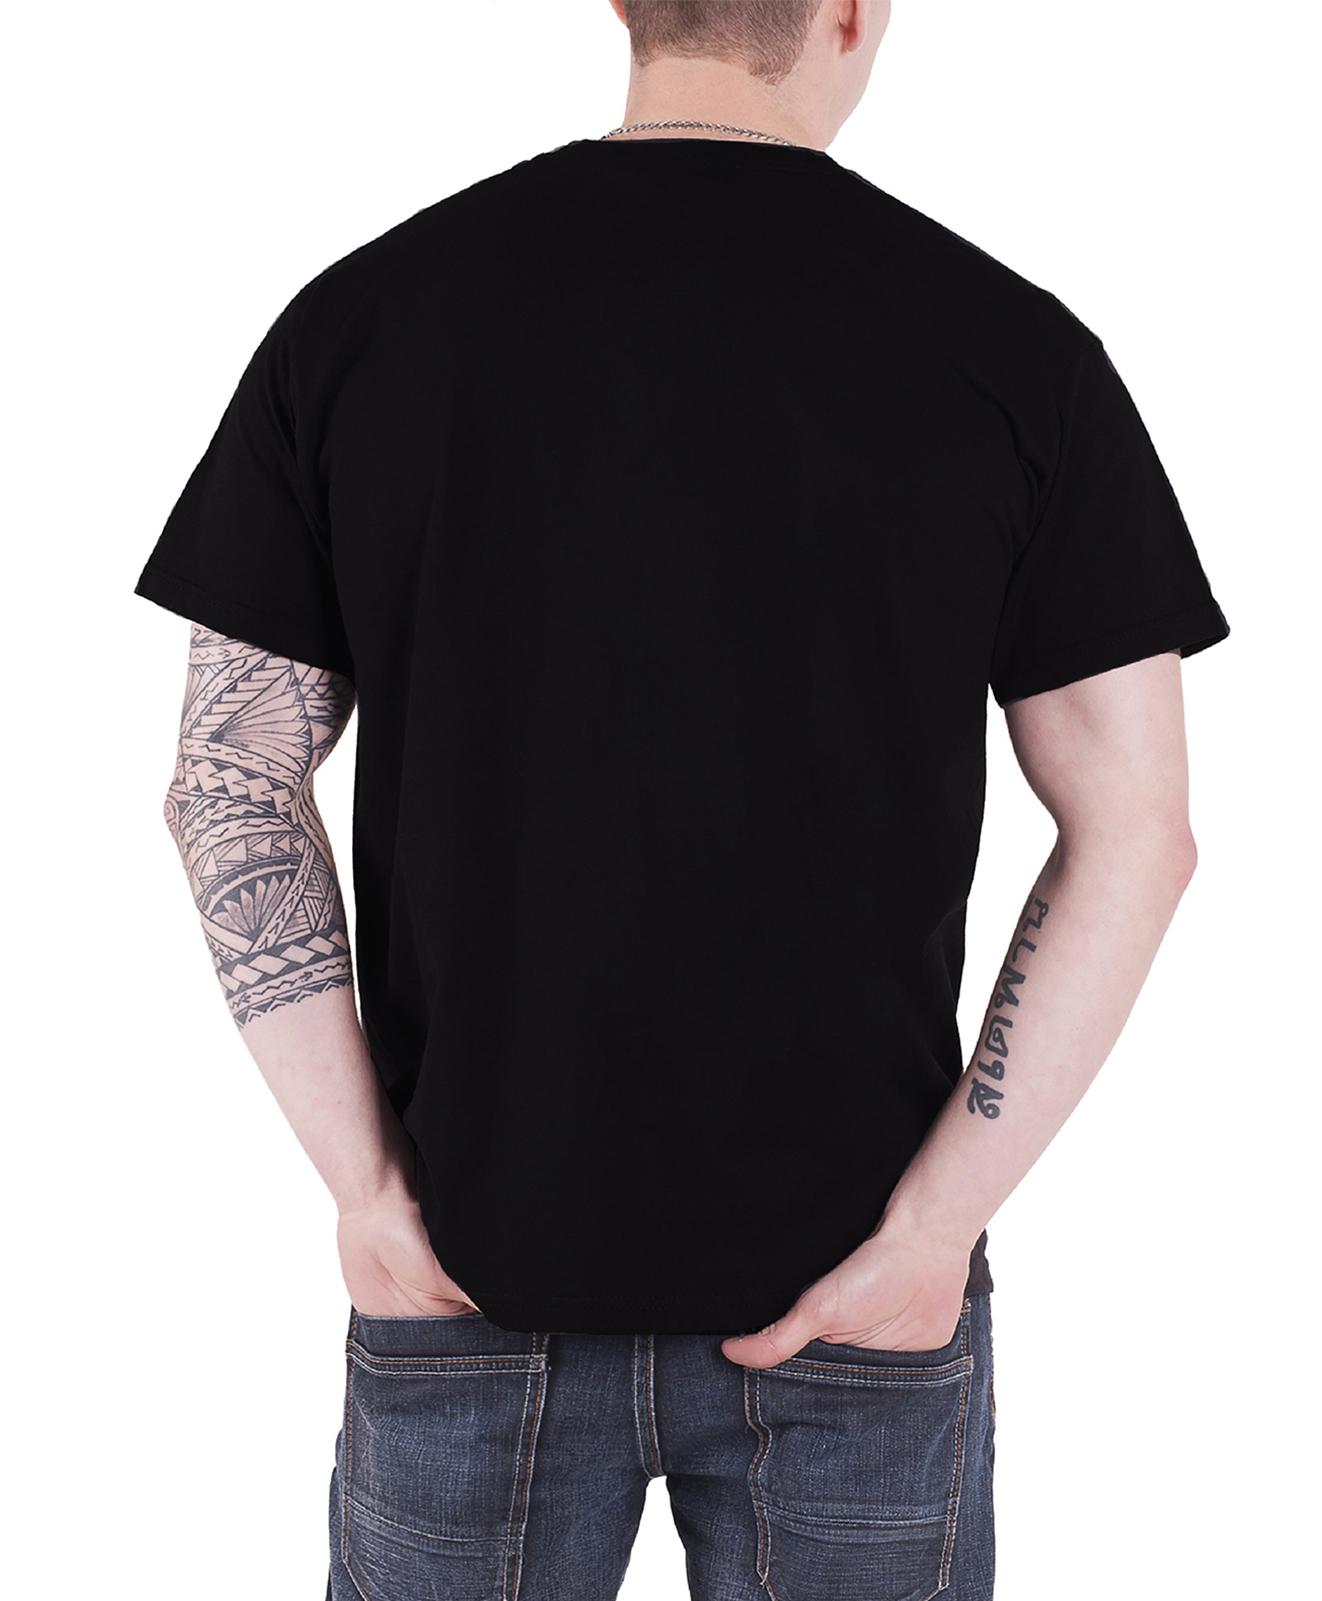 Official-Gas-Monkey-Garage-T-Shirt-Official-GMG-Logo-Kustom-Builds-new-Mens Indexbild 39